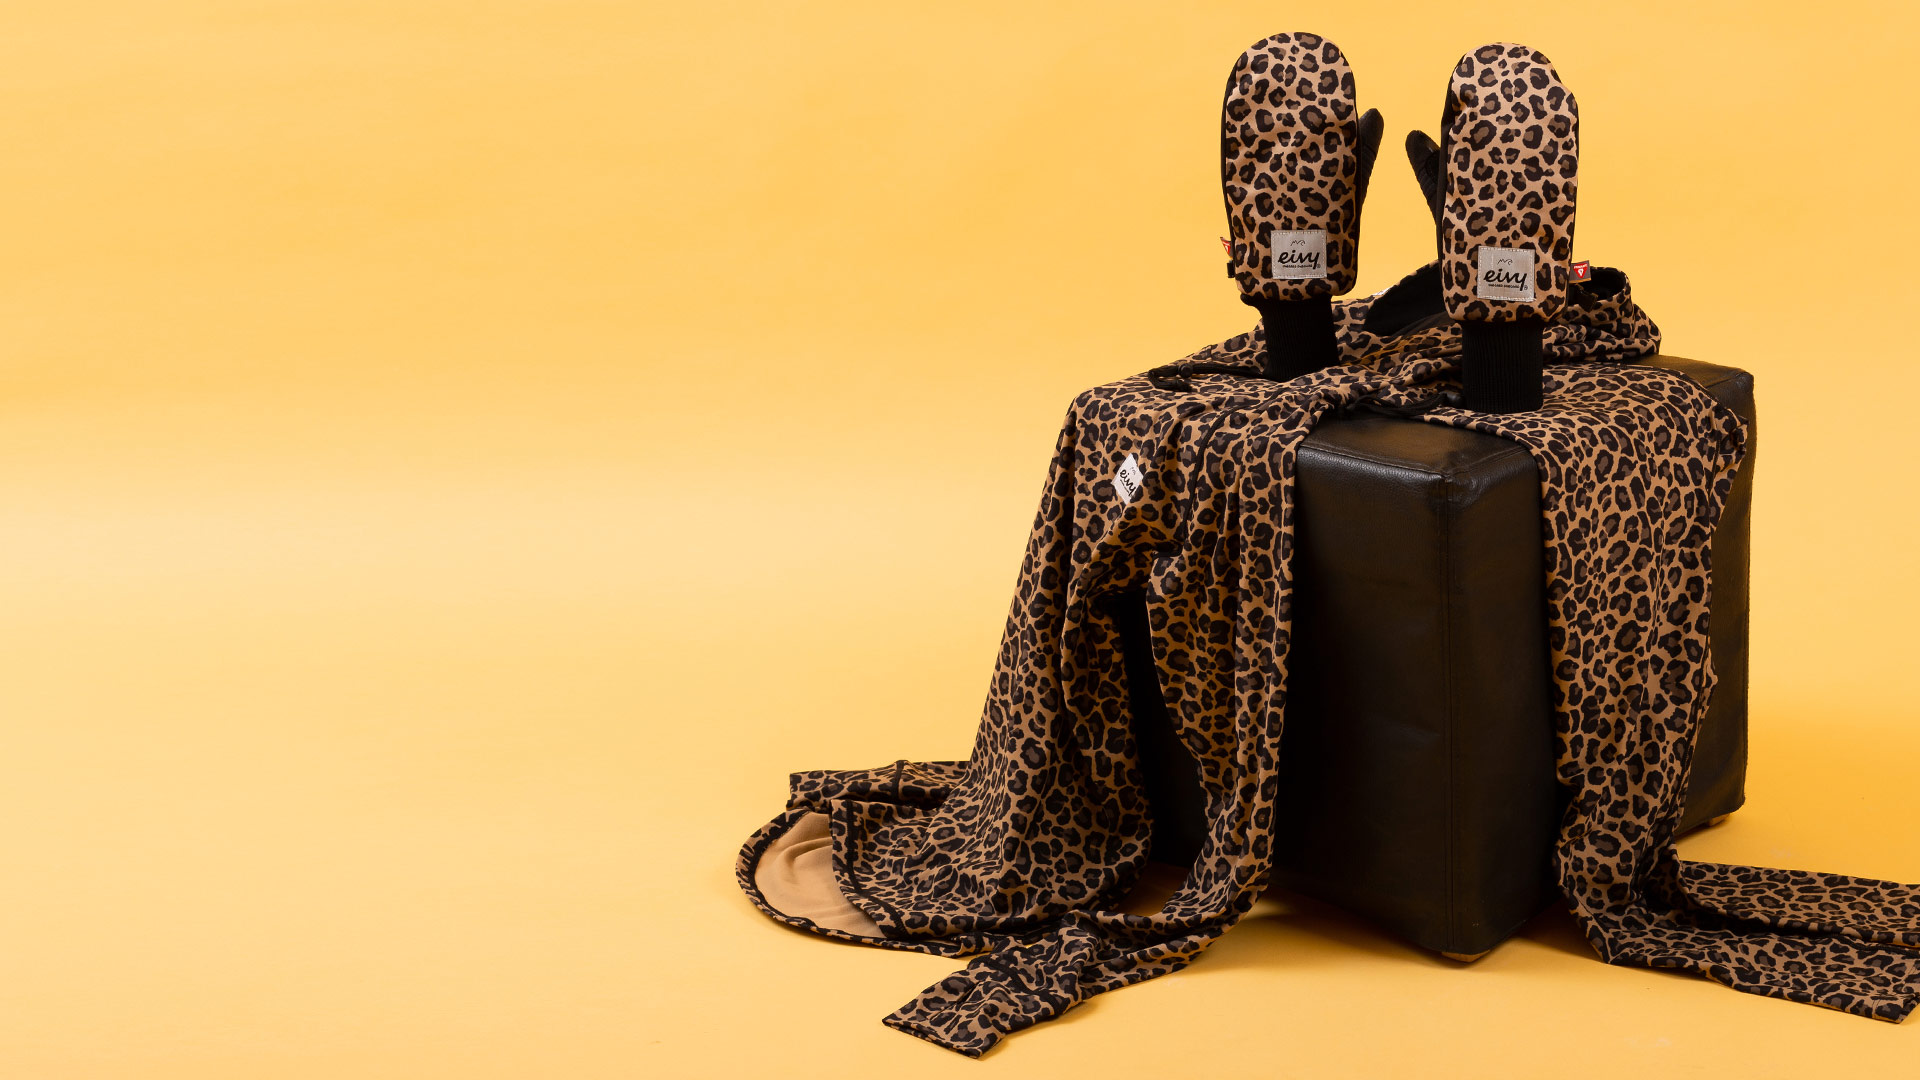 slider-image-https://www.eivyclothing.com/image/3738/Transform-x-Eivy-Mittens-Shopbyprint-leopard.jpg